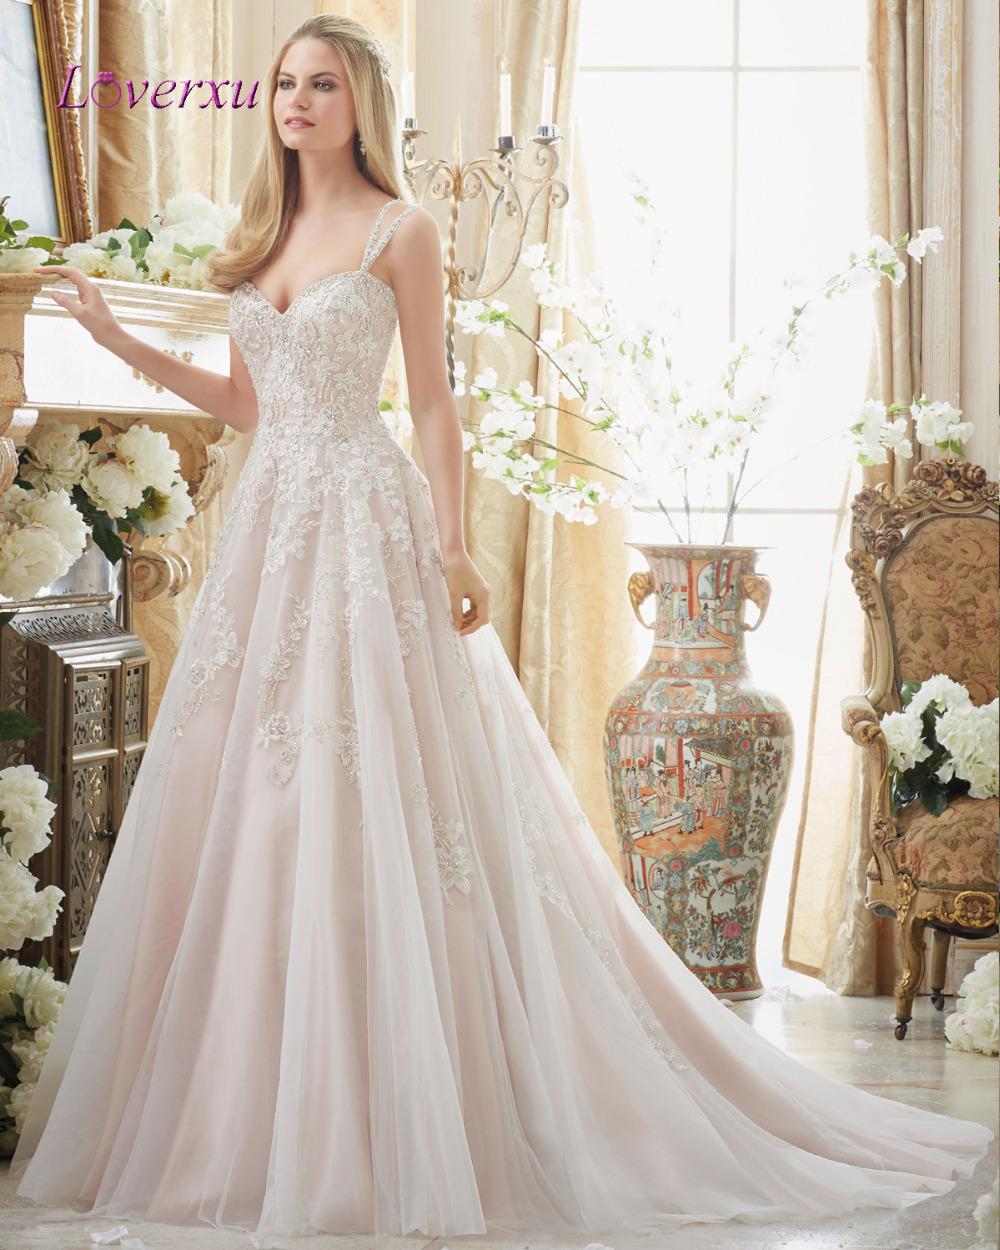 Wholesale wedding dresses canada bridesmaid dresses for Unique wedding dresses toronto